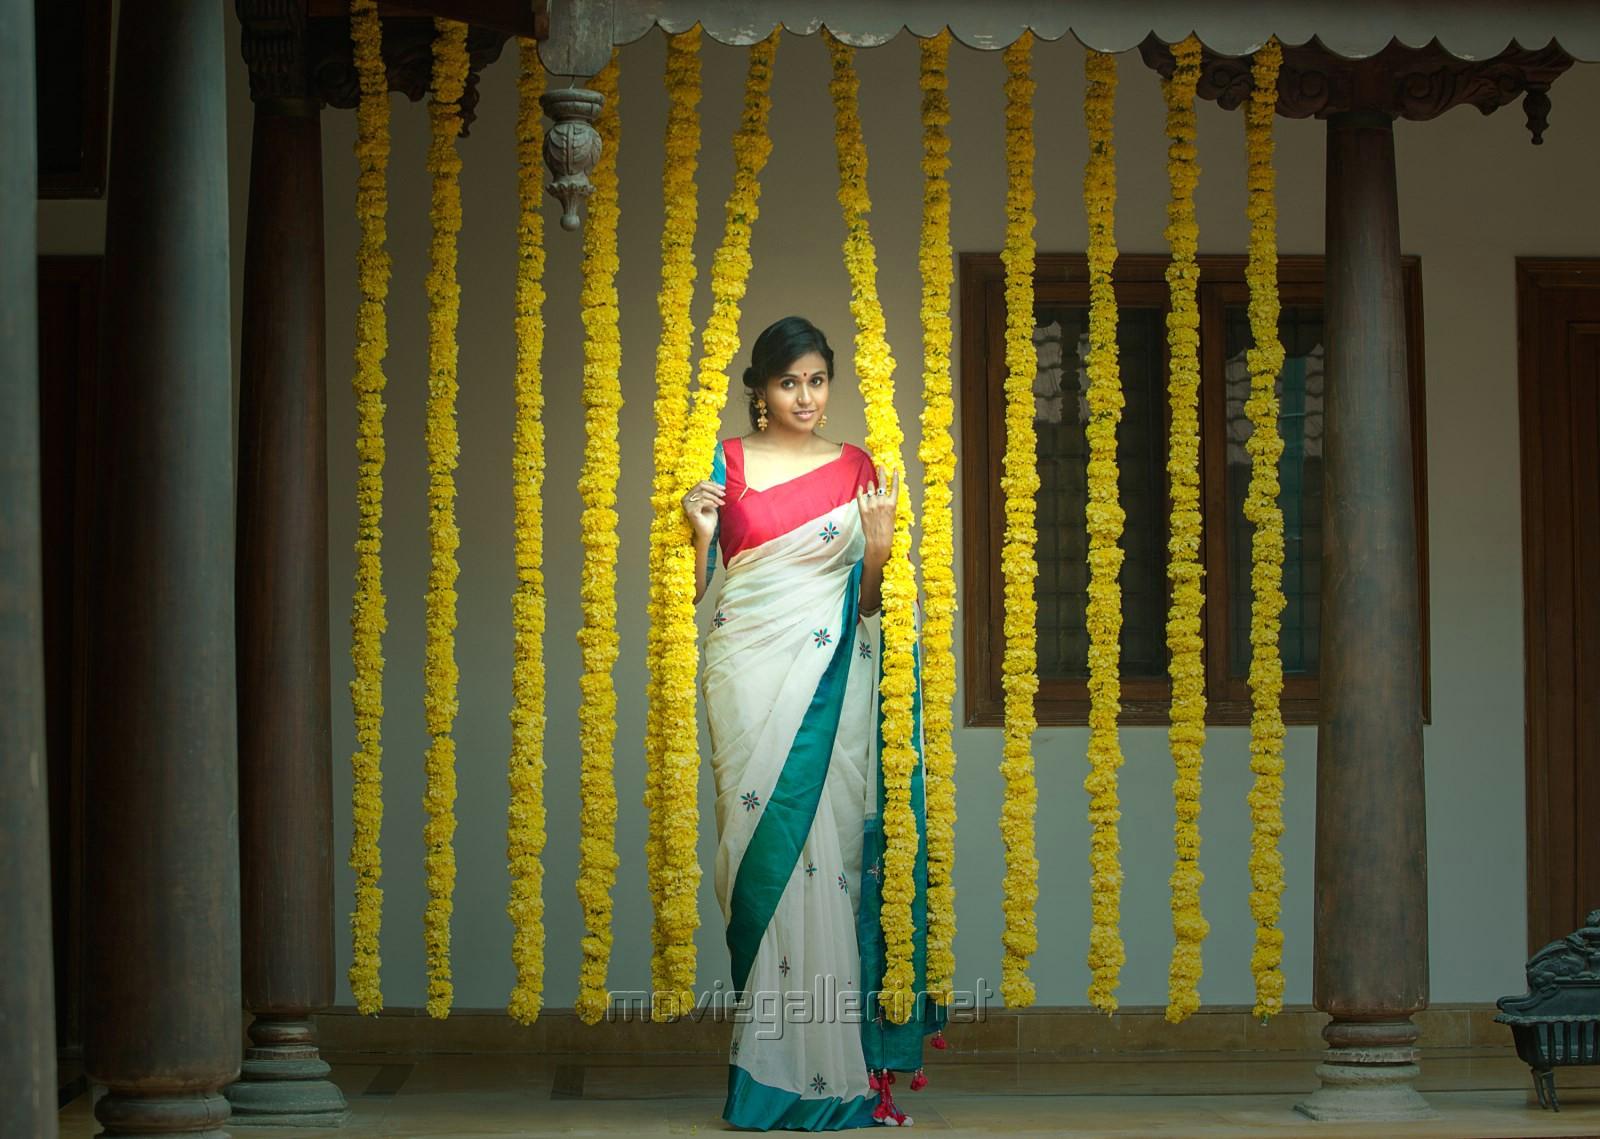 Singer Smitha in Saree Photoshoot Stills for Aalayam Navaratri festival